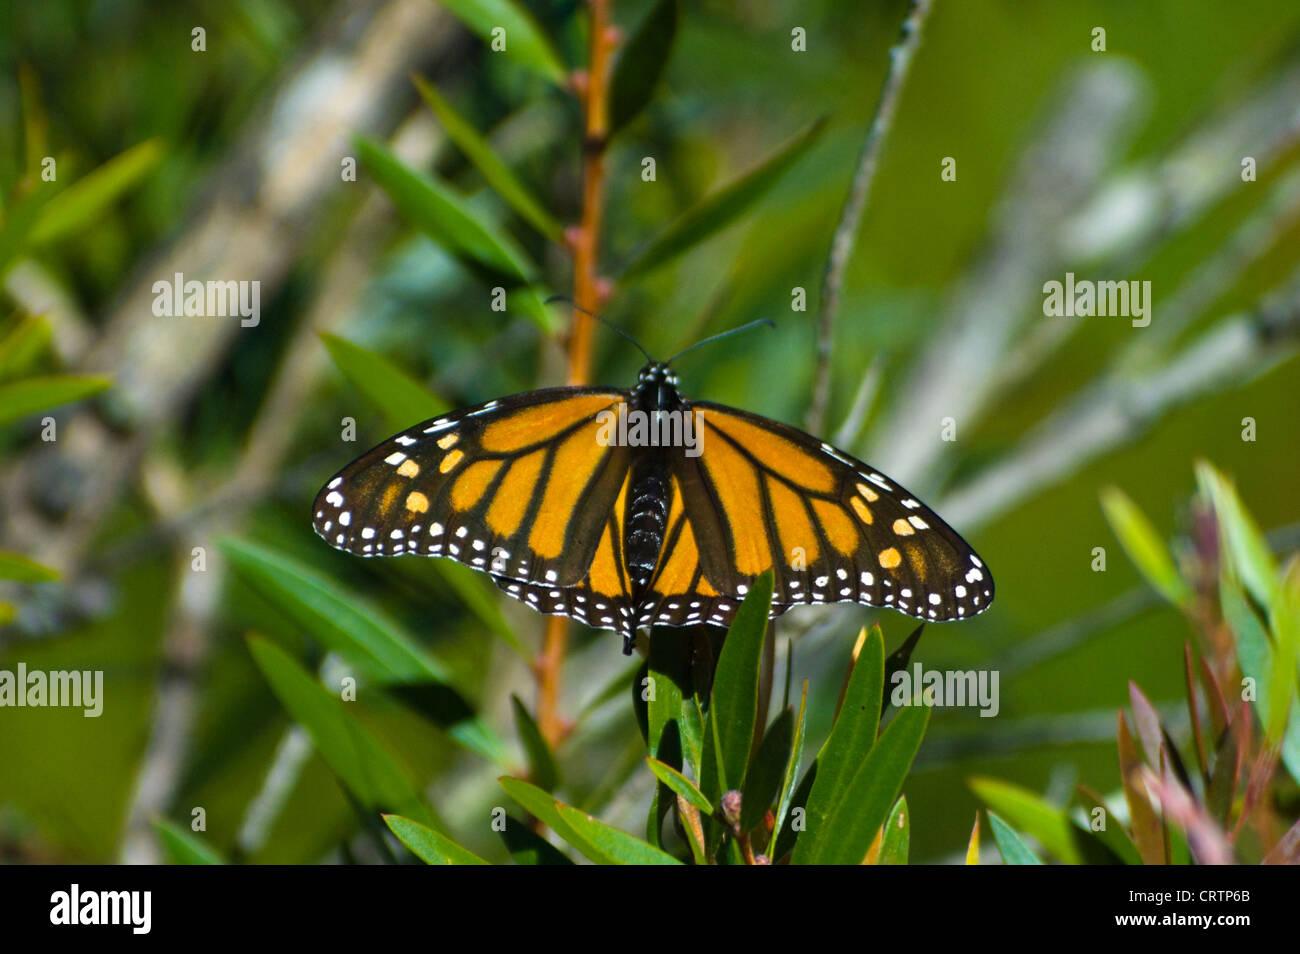 Wanderer Butterfly (Danaus plexippus) - Stock Image